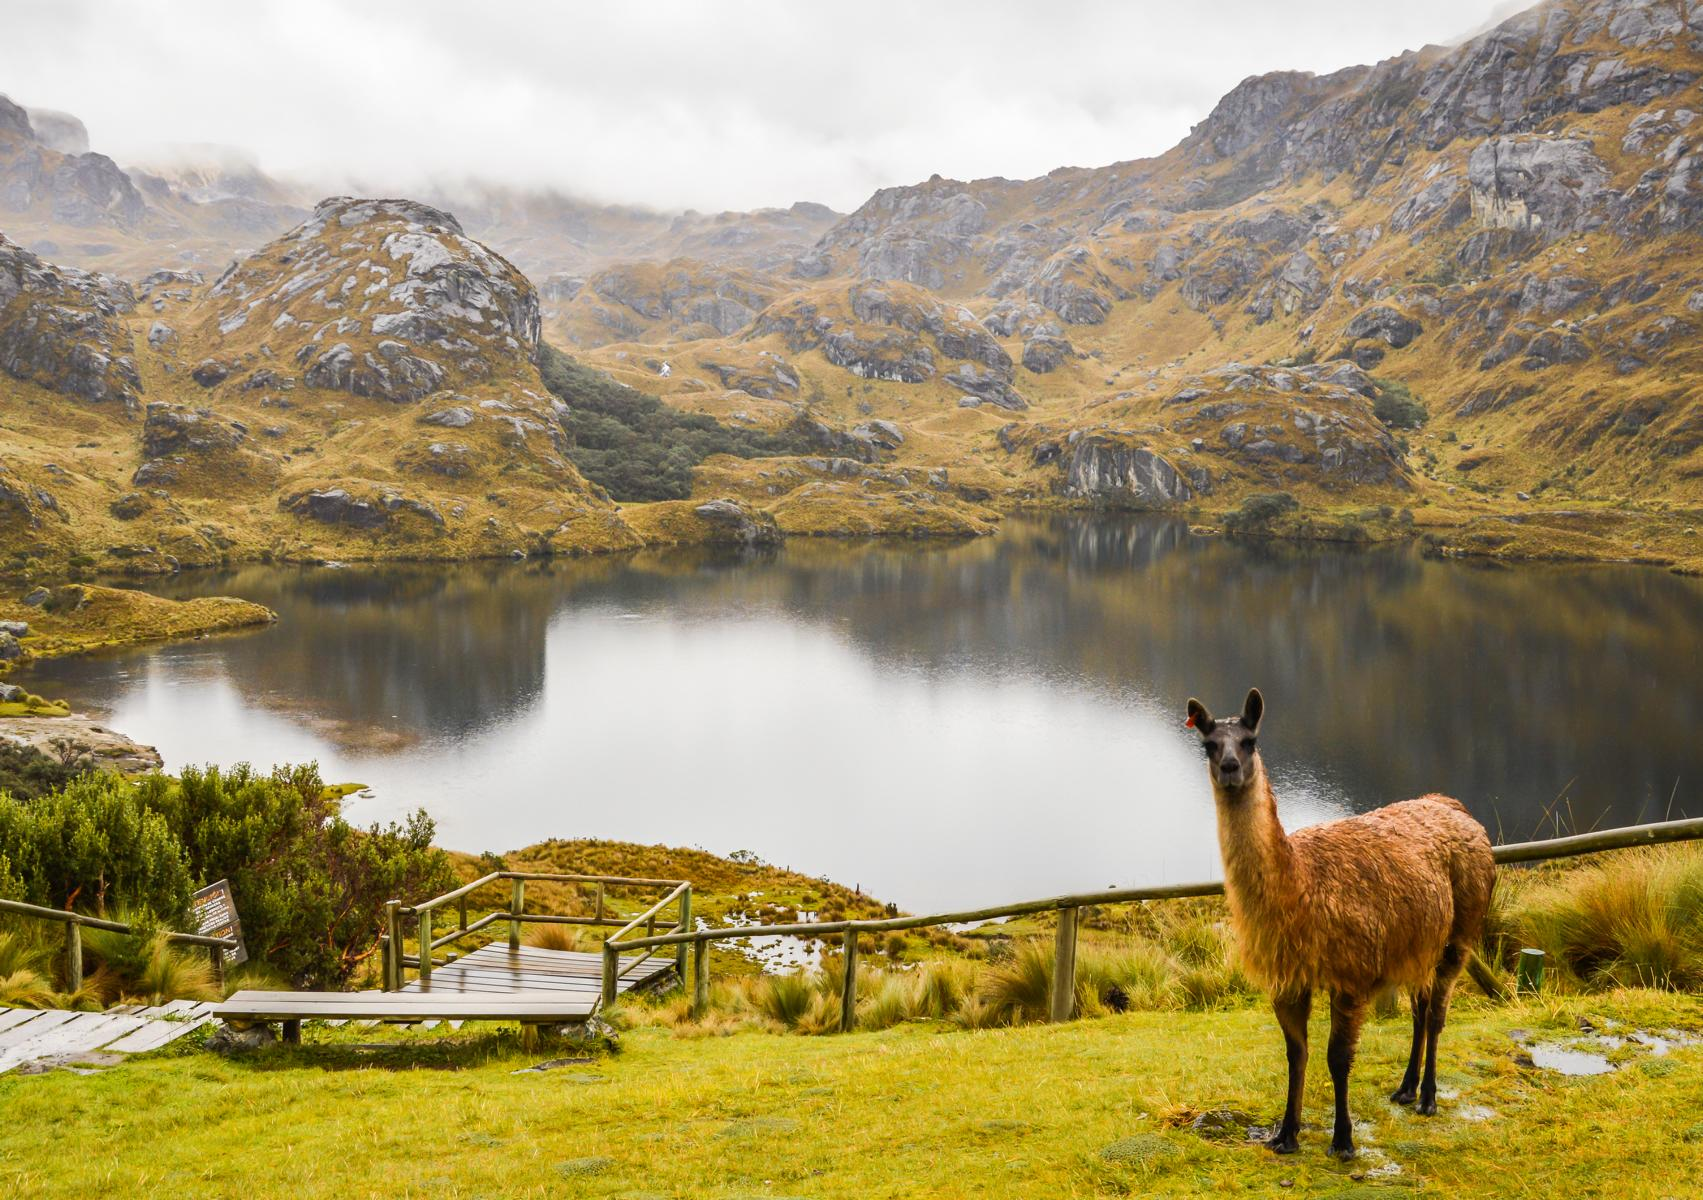 Rundreise - K1600_shutterstock-271305959-ecuador-cajas-national-park.jpg